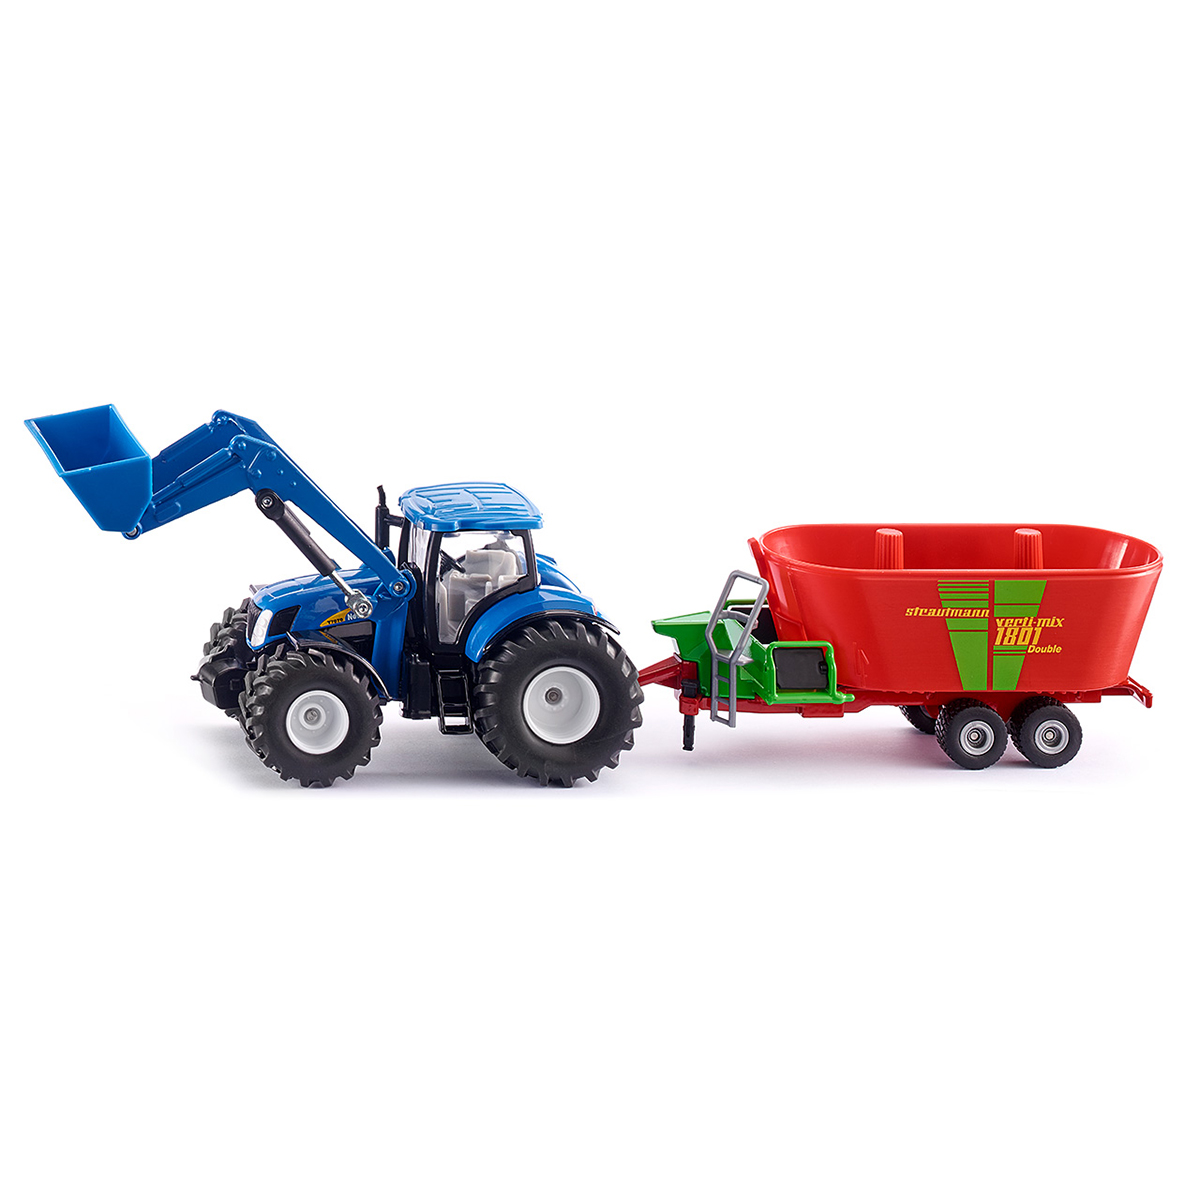 New Holland Strautmann fodder mixer(ジク・SIKU)1:50